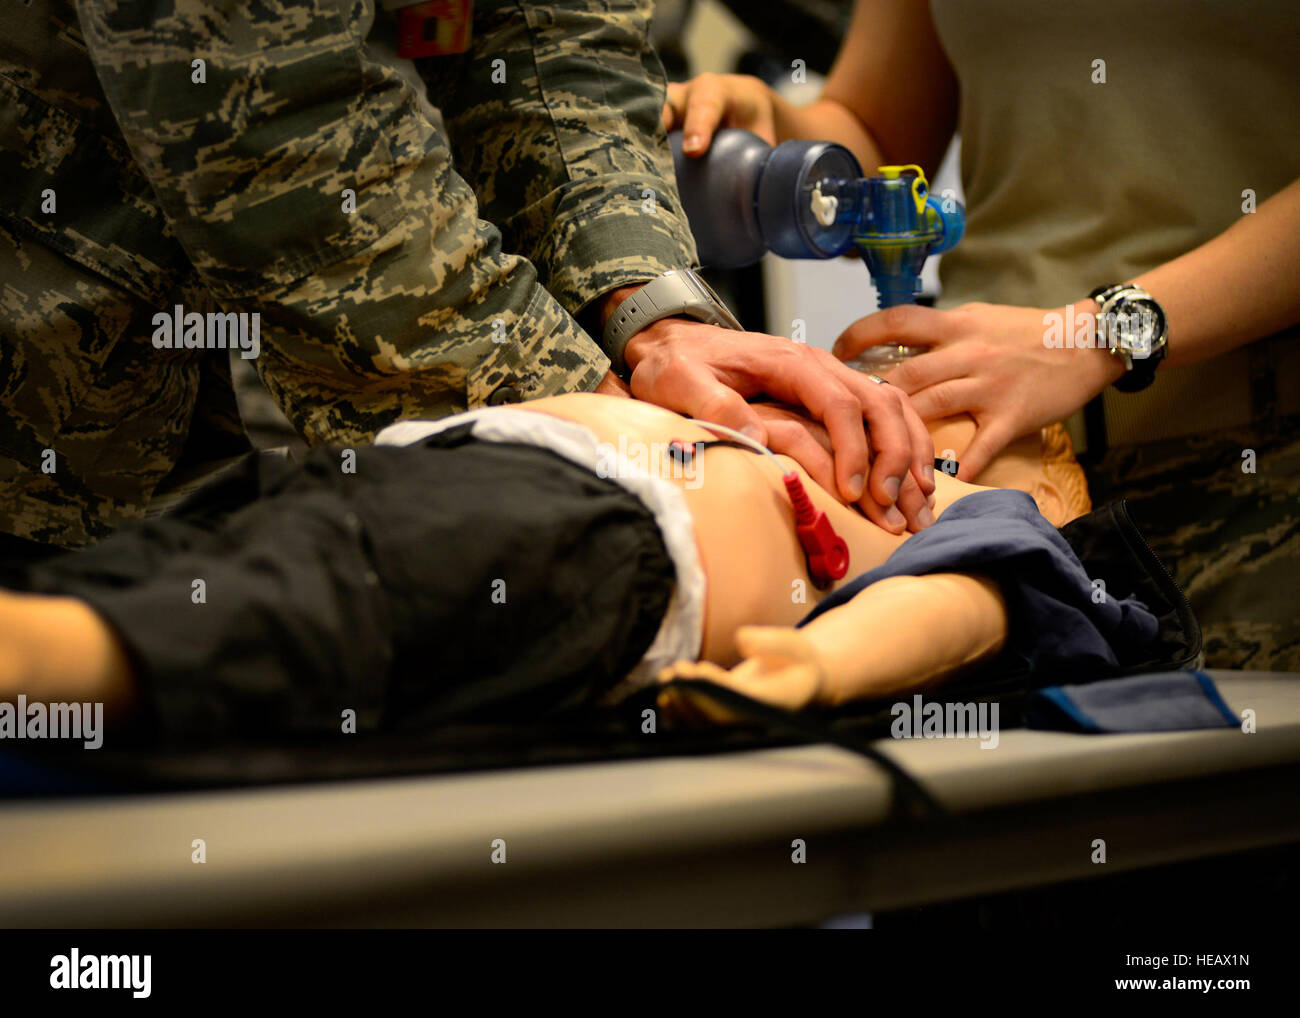 Pediatric Advanced Life Support training students practice pediatric cardiopulmonary resuscitation, July 8, 2015, - Stock Image